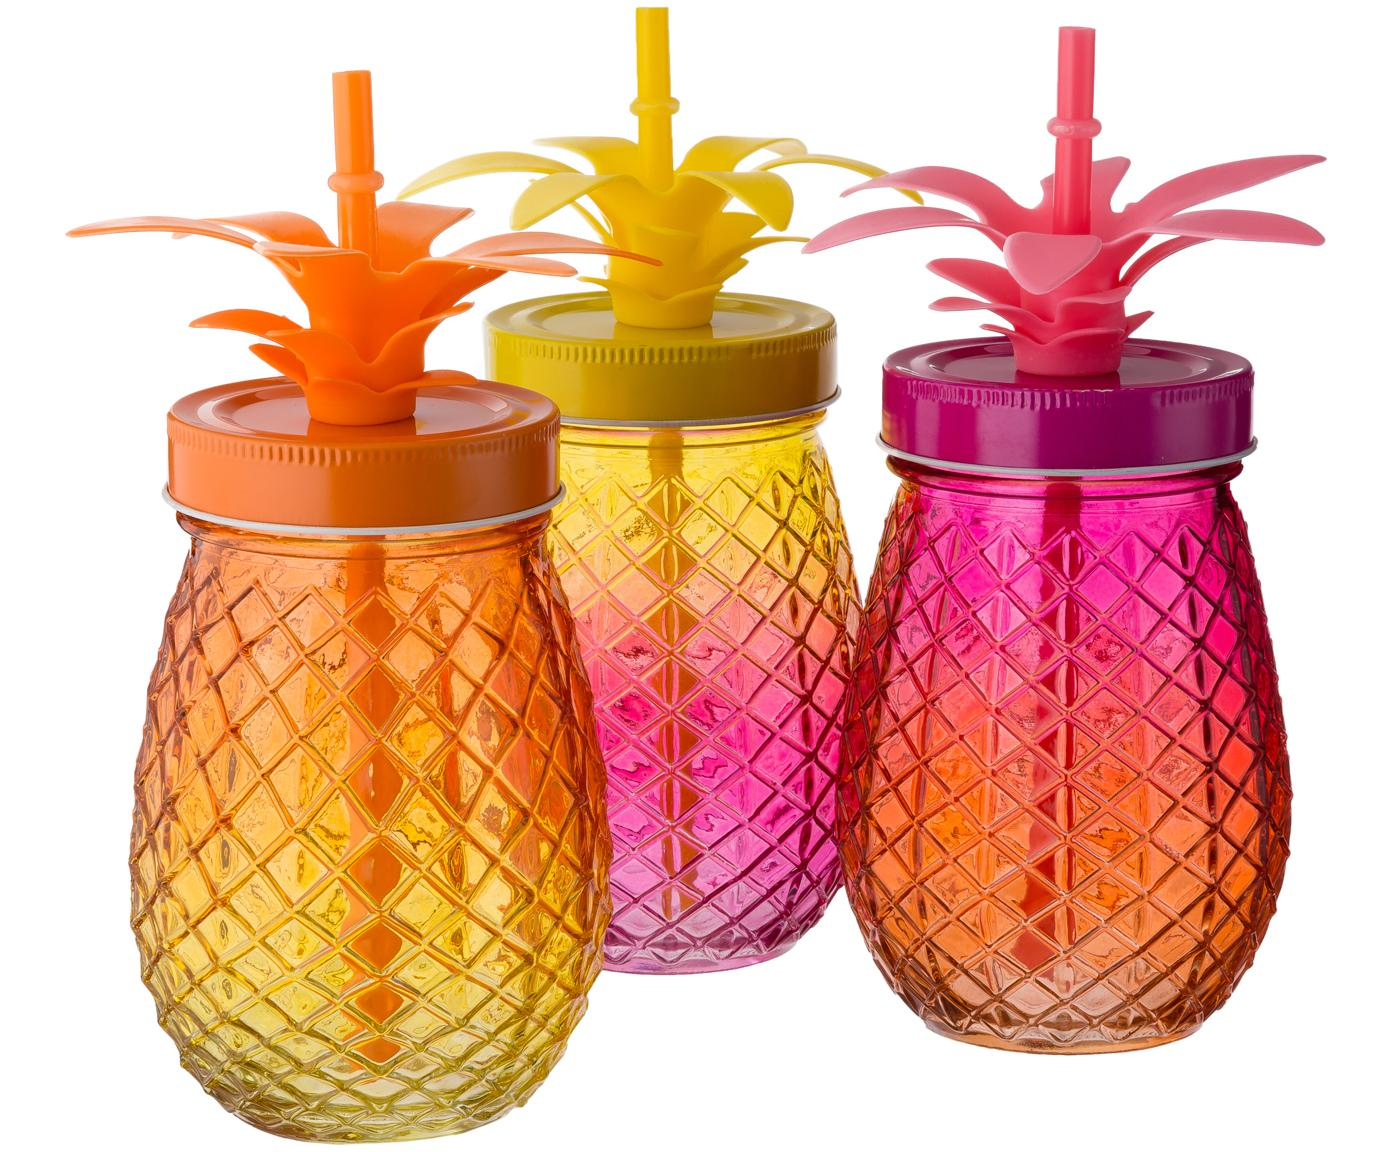 Vasos de cóctel Piñas, 3uds., Tapa: metal, Rosa, naranja, amarillo, Ø 9 x Al 14 cm